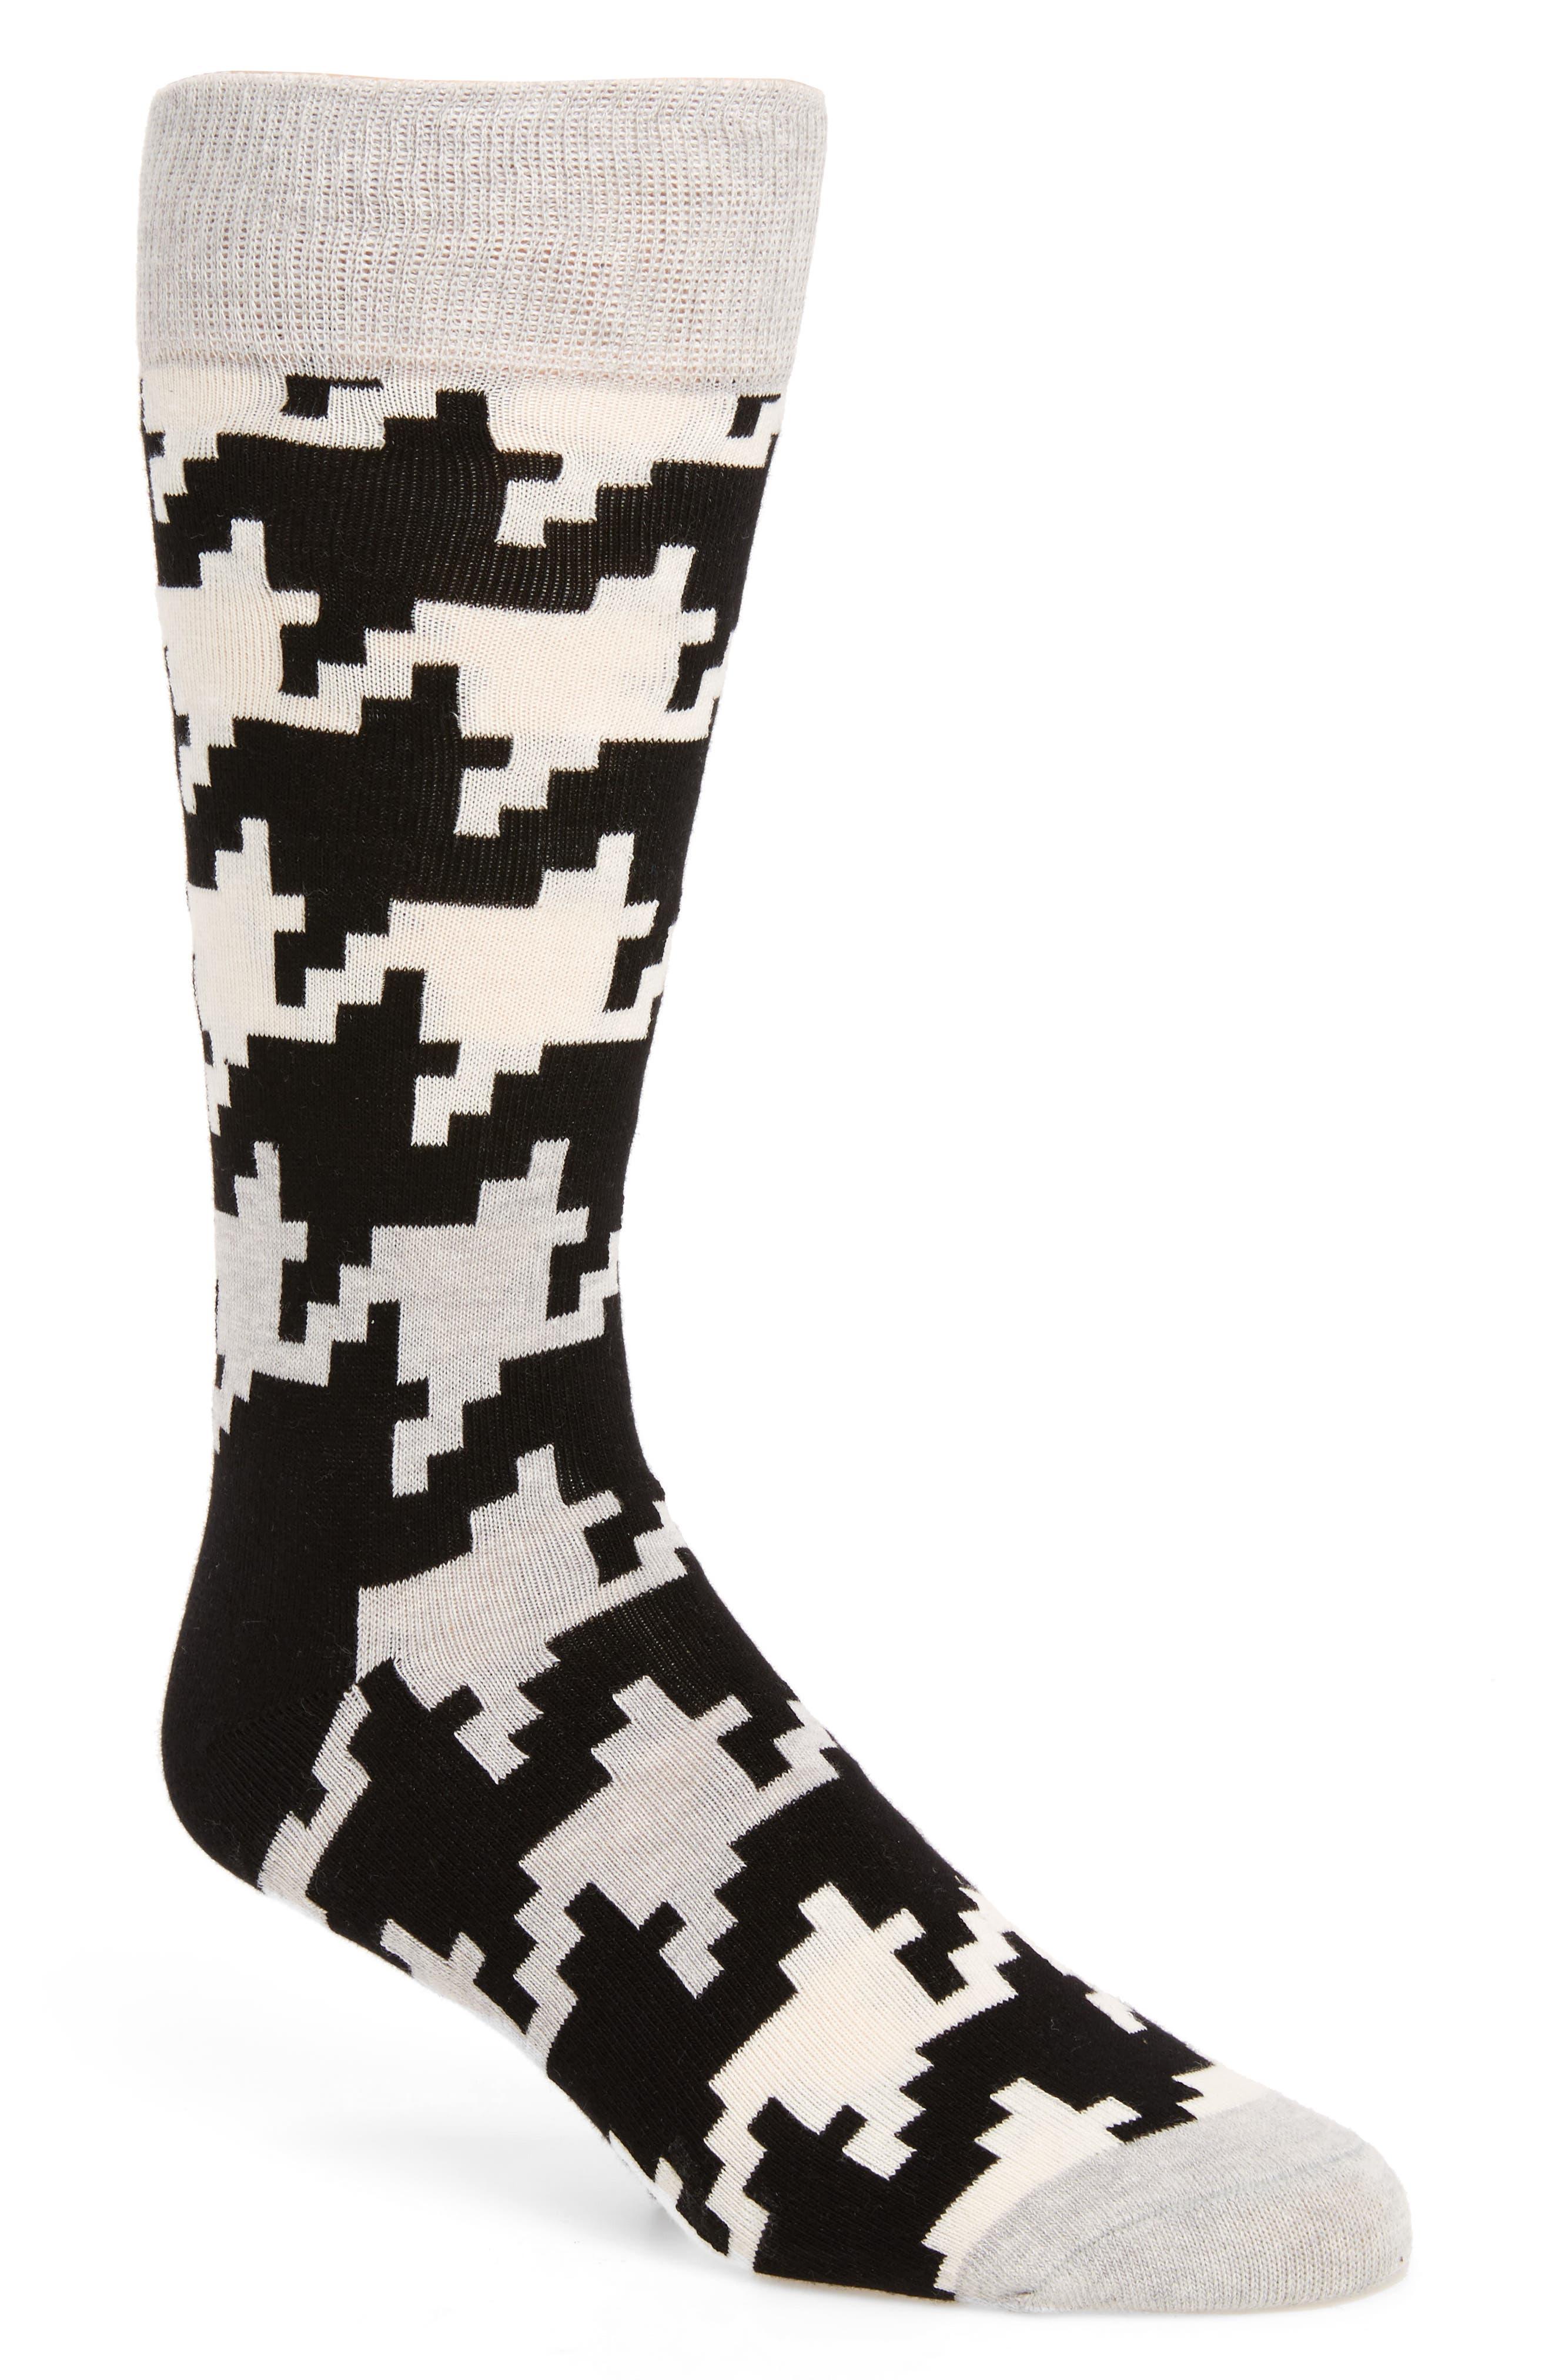 Main Image - Happy Socks Digital Houndstooth Socks